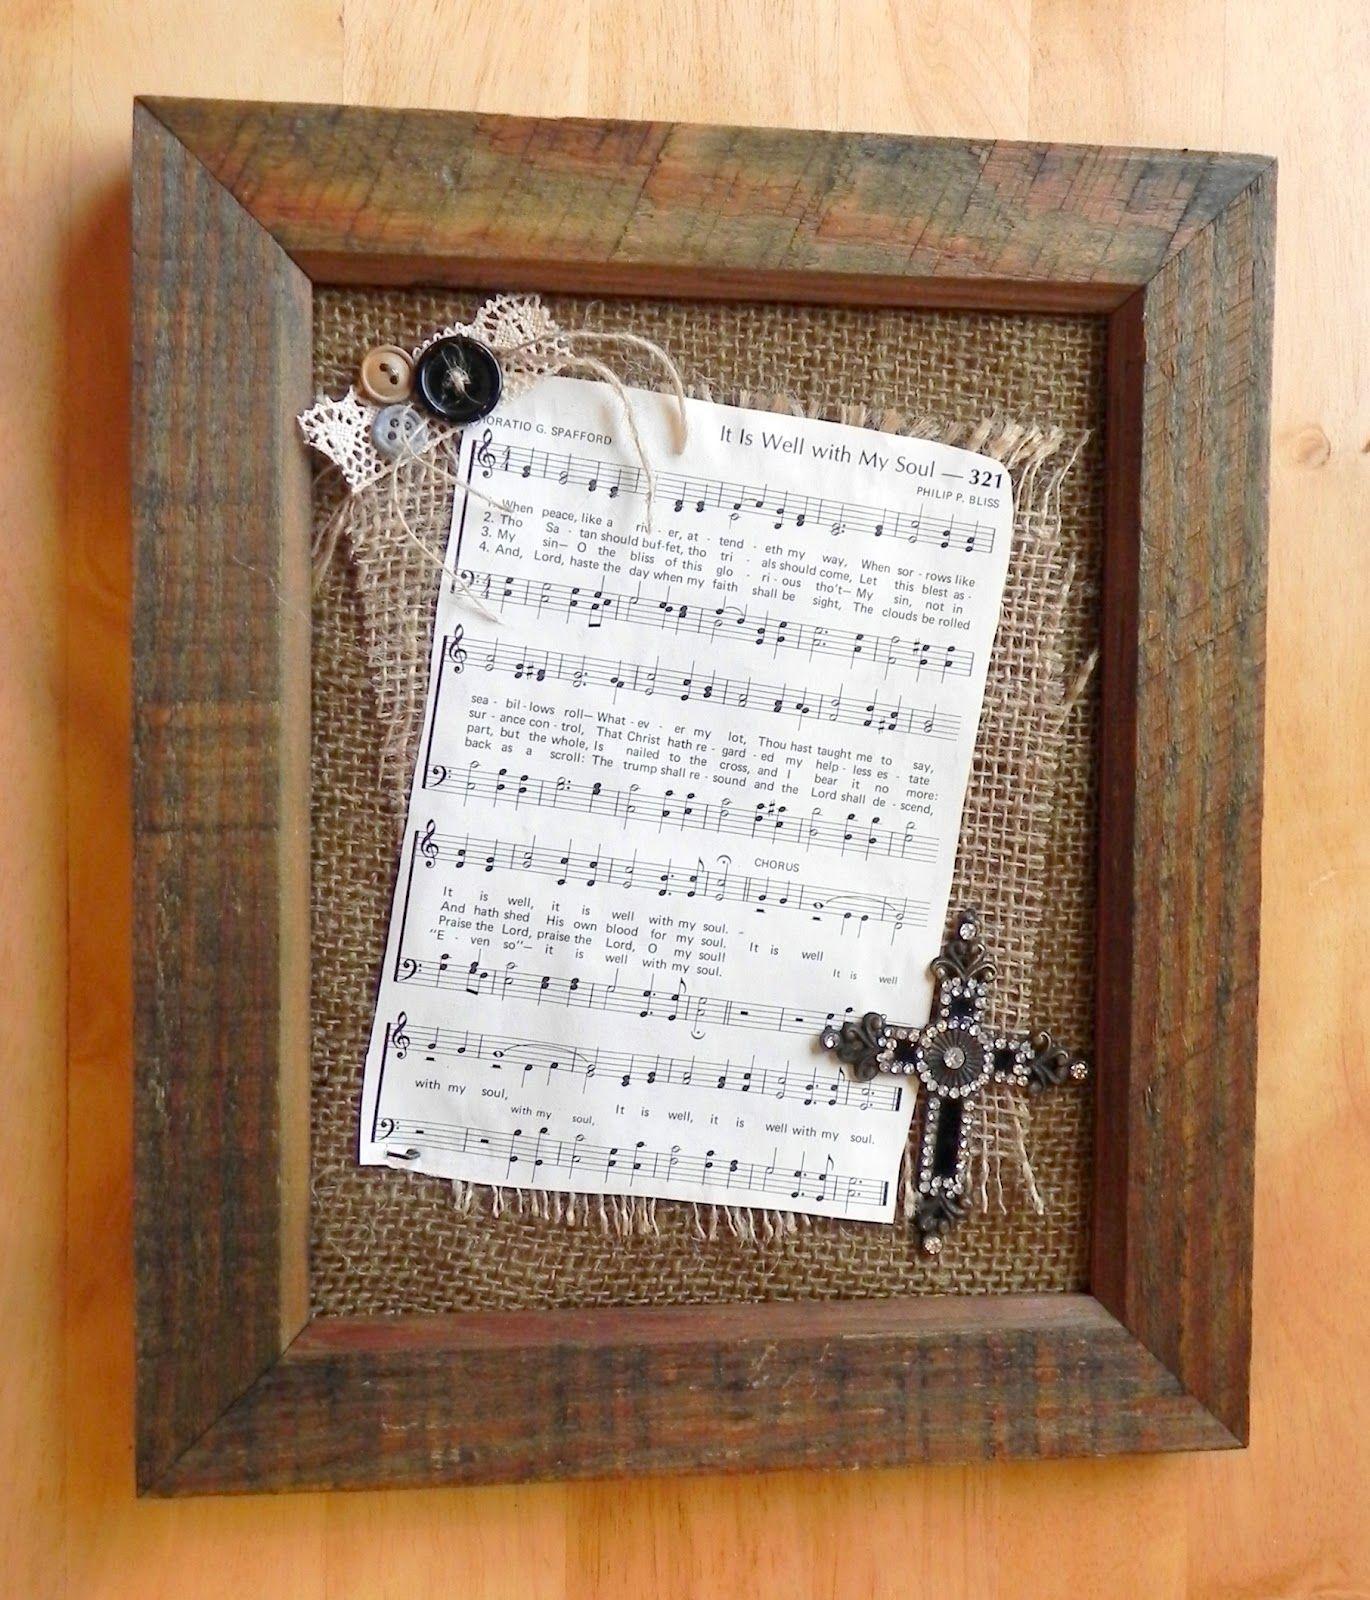 Old Rugged Cross Saxophone: Hymnal, Burlap, & Tin Can